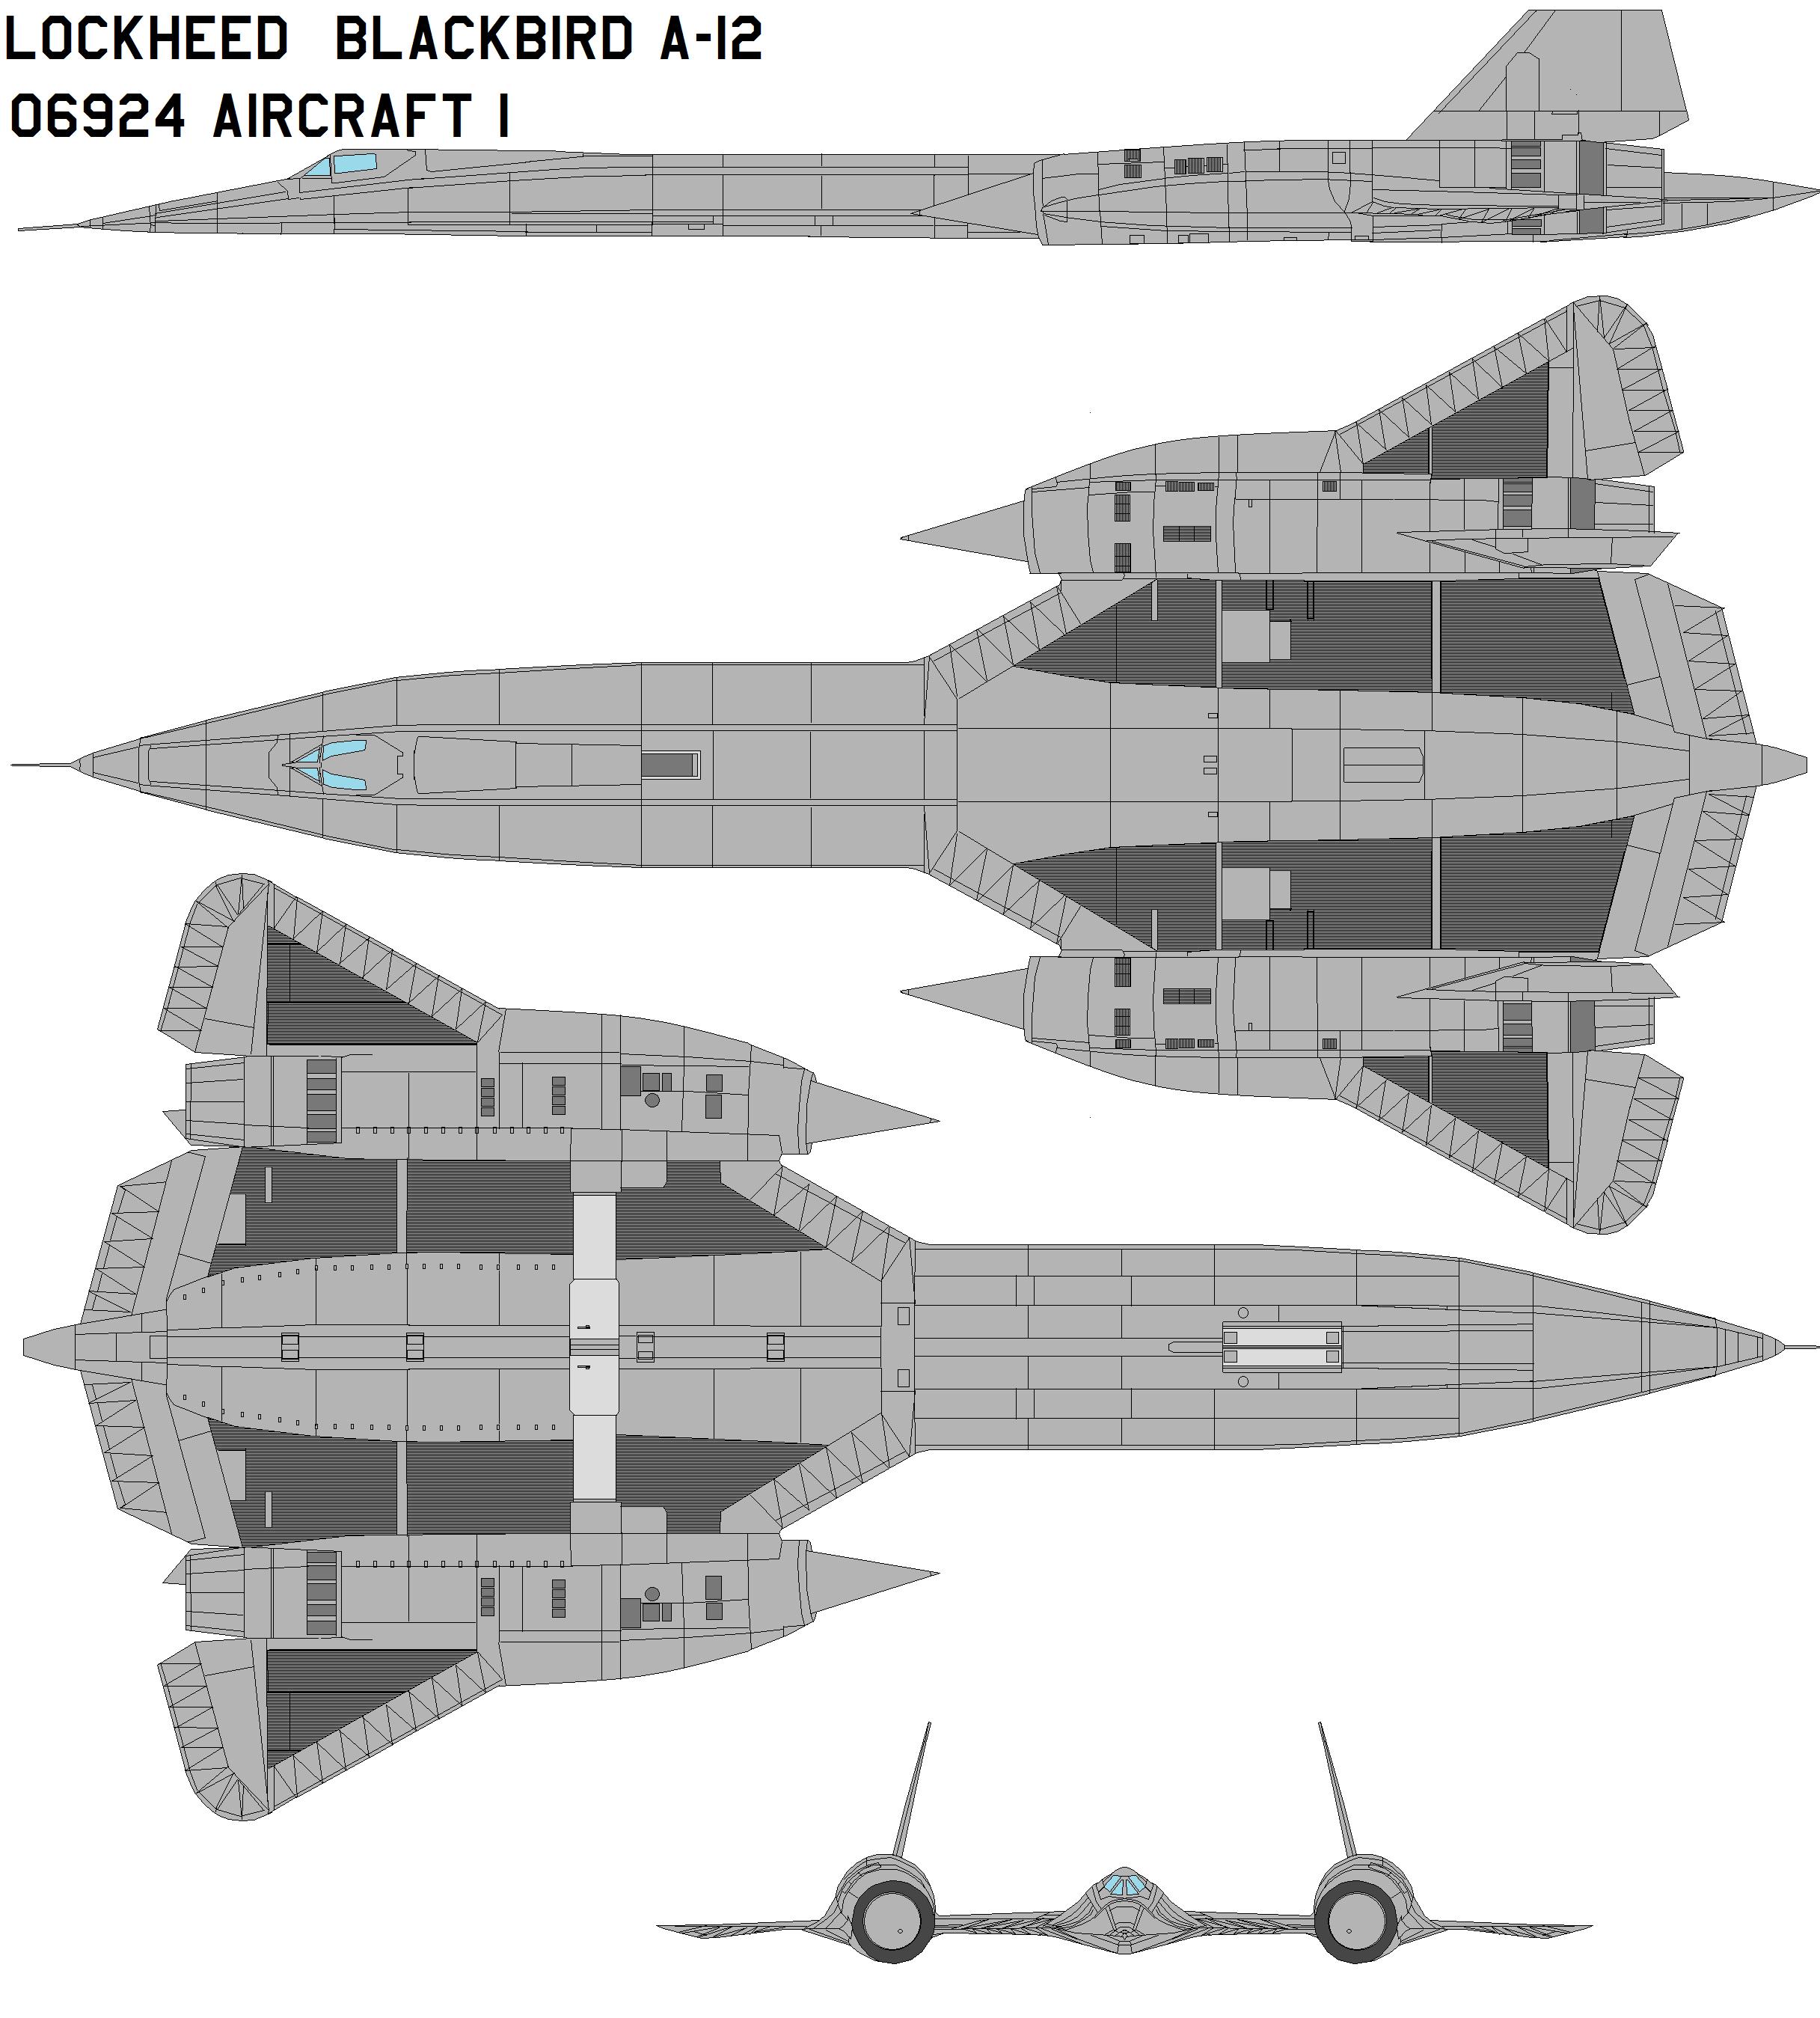 Lockheed A-12 60-6924 bird 1 by bagera3005